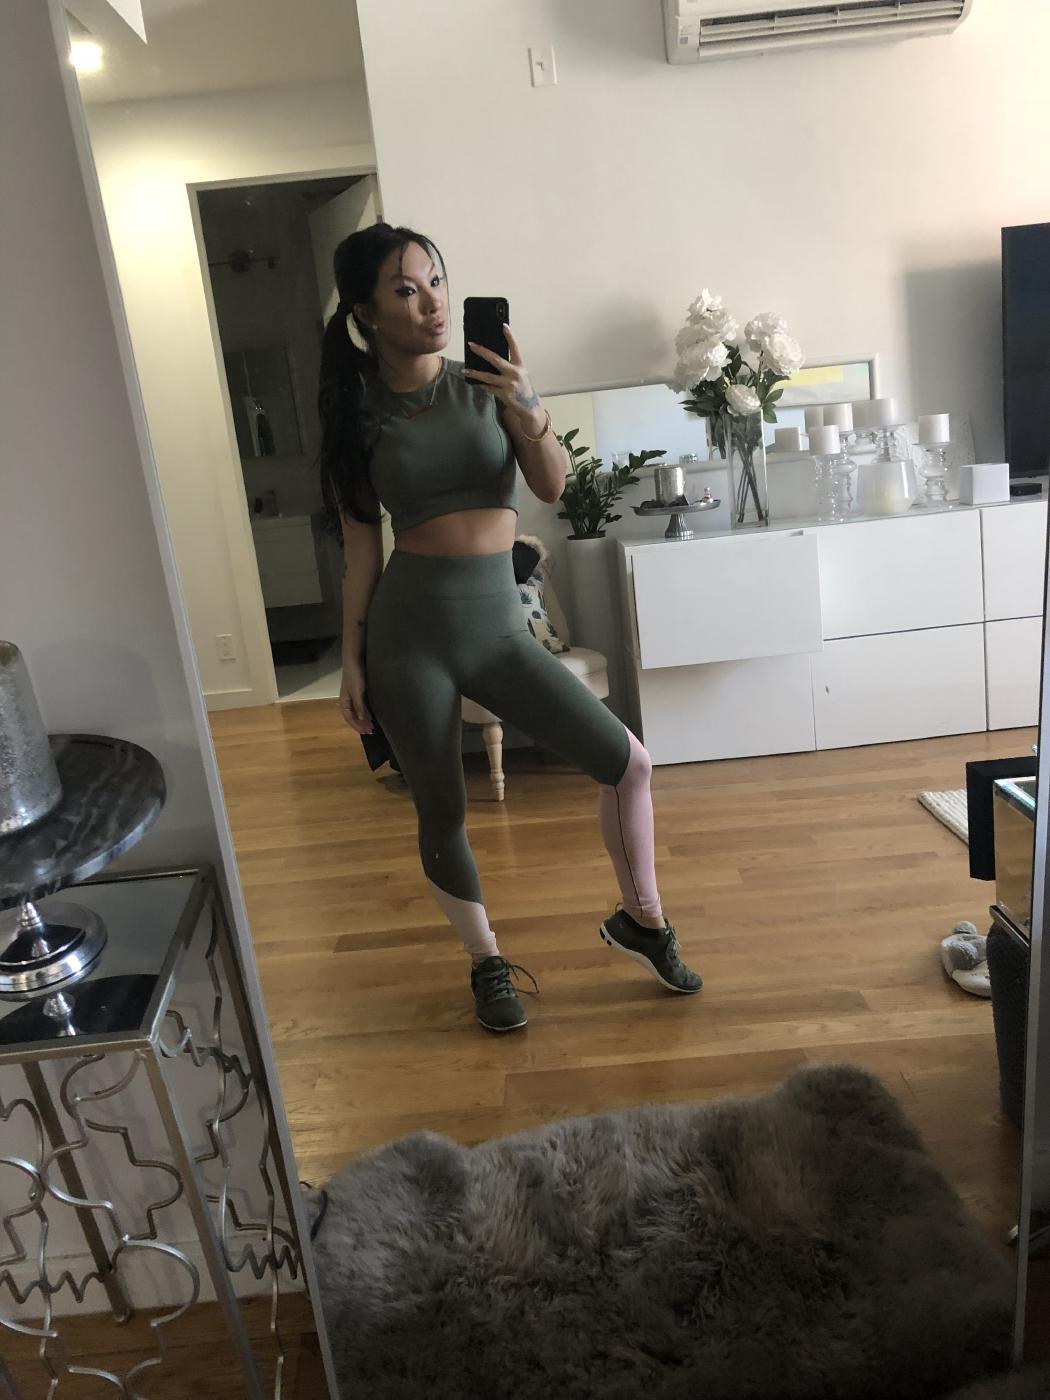 Asa Akira Nude Mirror Selfie Onlyfans Set Leaked Whfavj